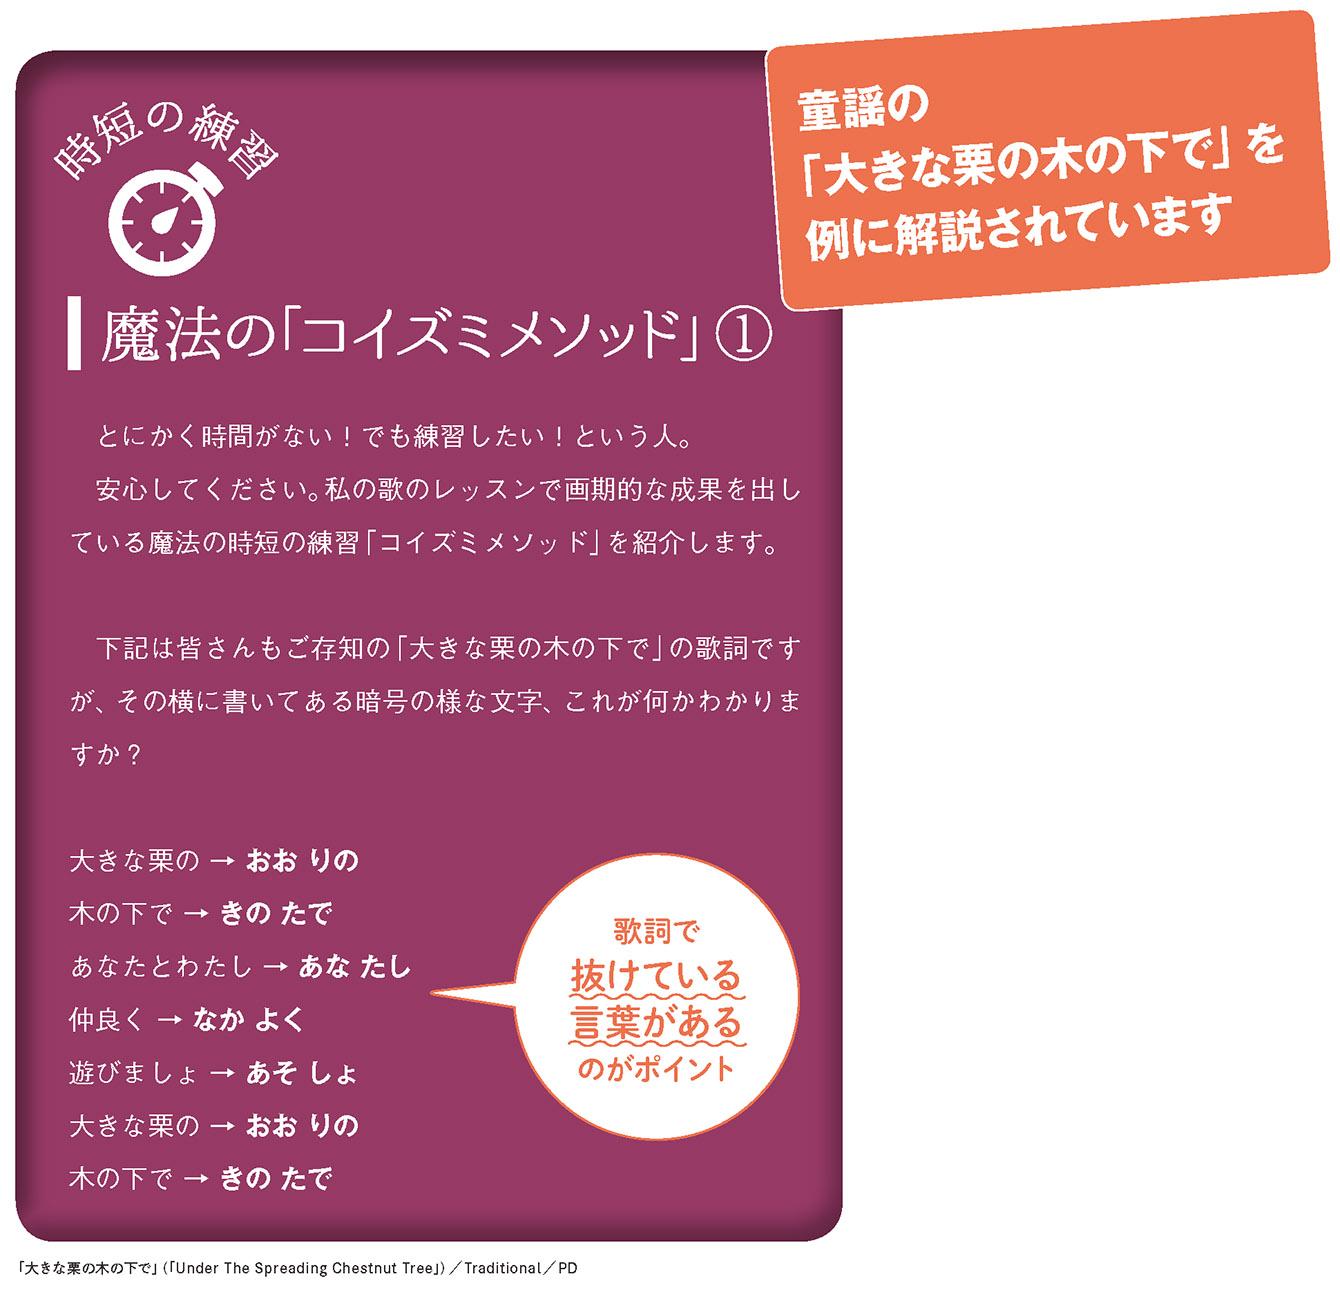 http://musicschool-navi.jp/columns/keion_v1_vo01.jpg